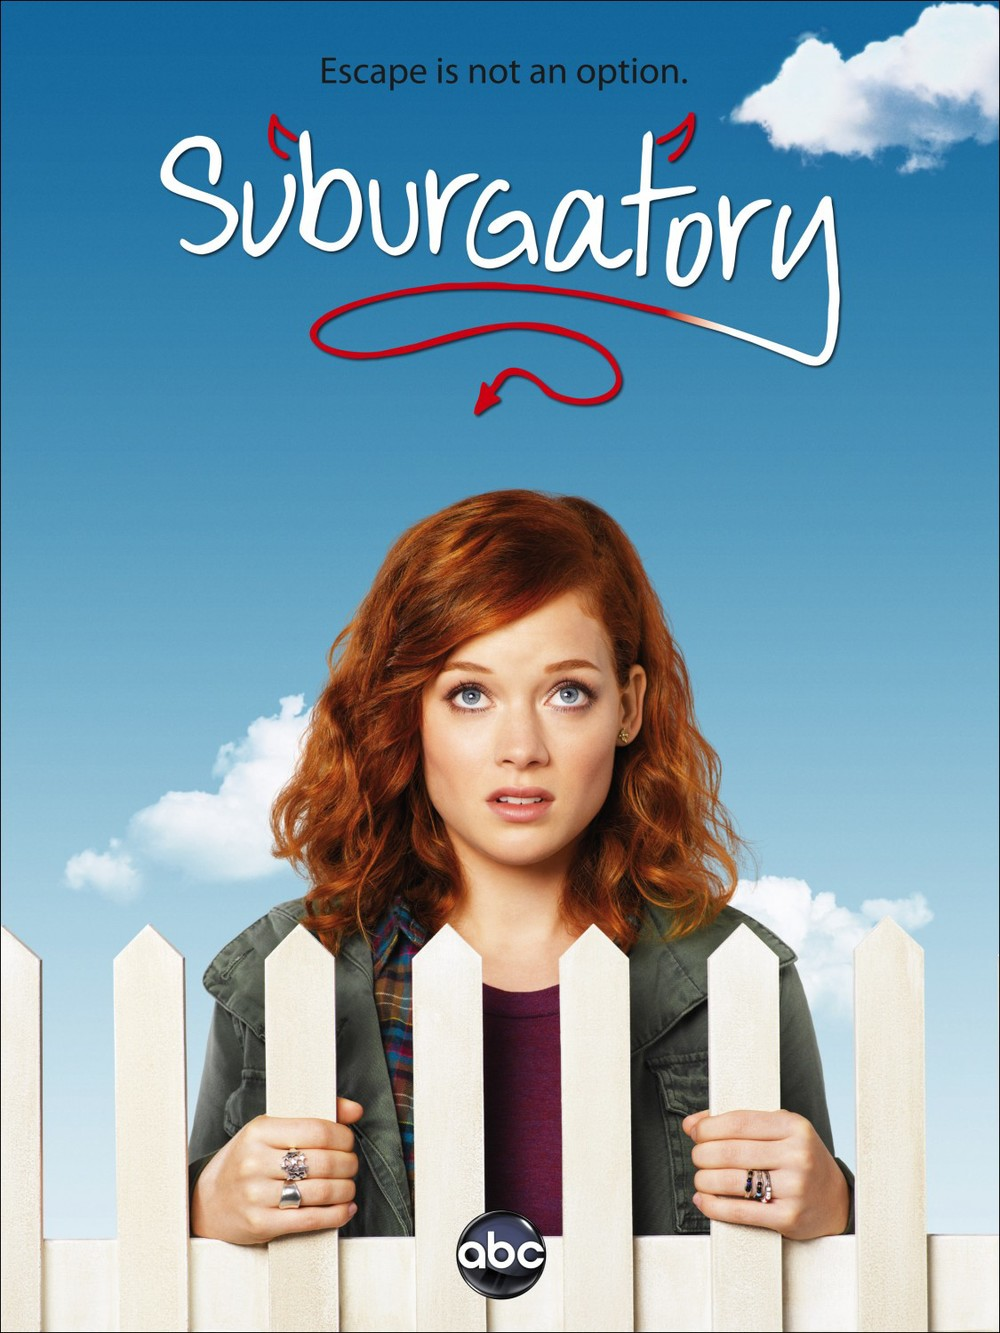 suburgatory.jpg